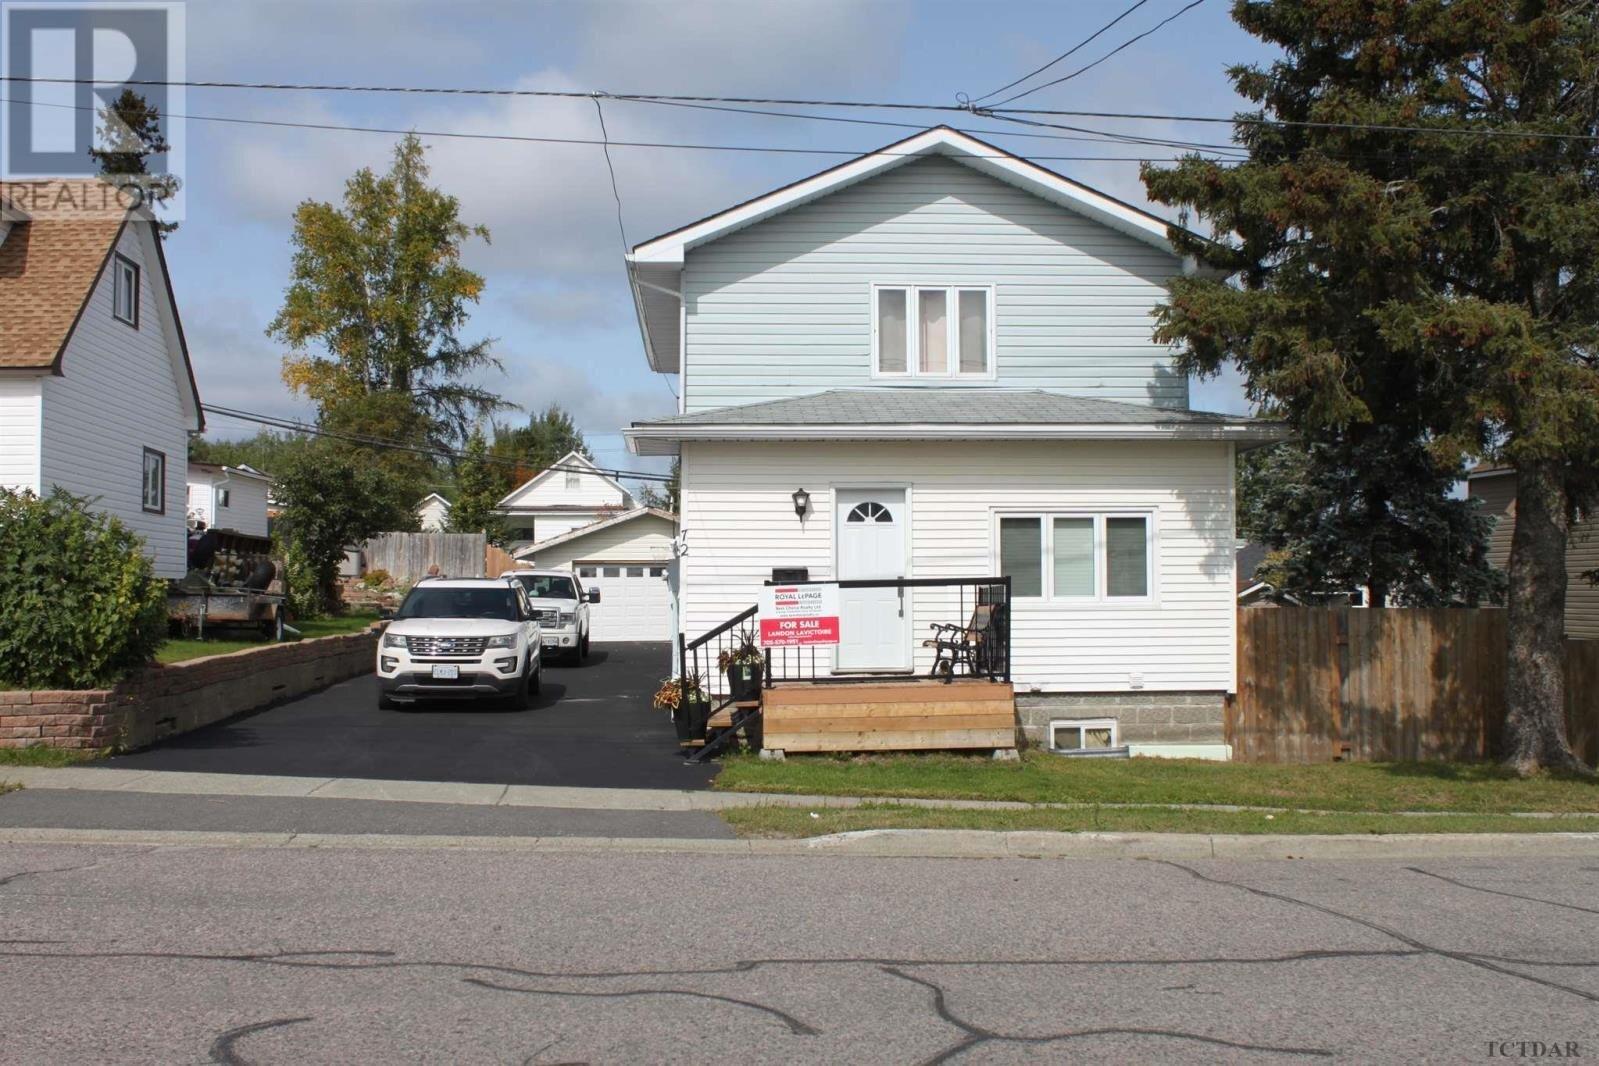 House for sale at 72 Second St E Kirkland Lake Ontario - MLS: TM200359